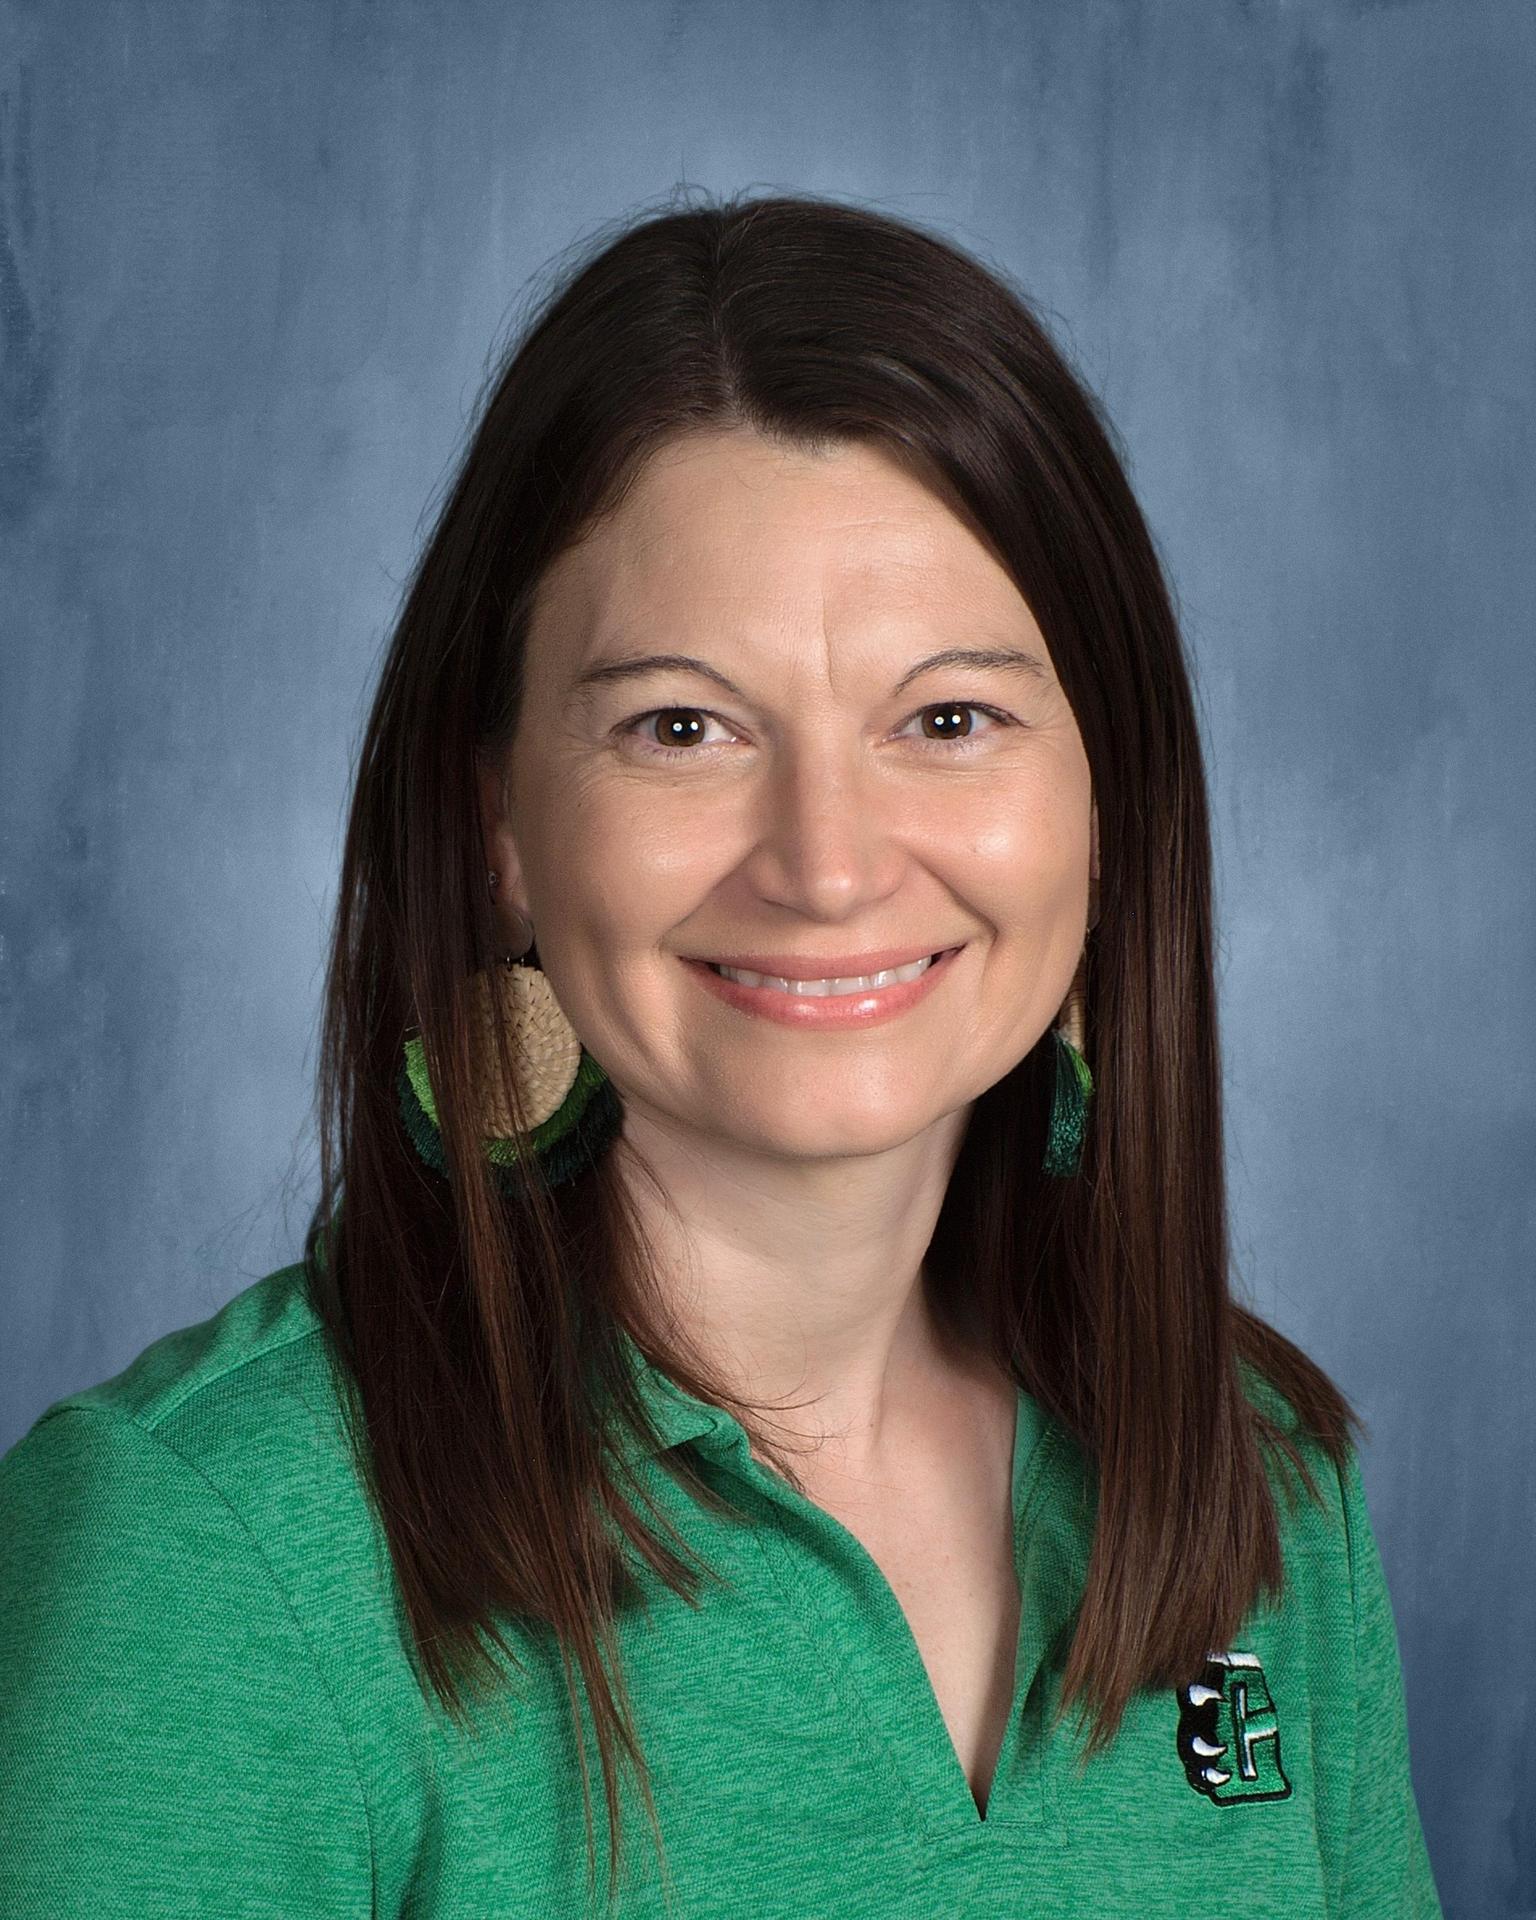 Tiffany Jones, Curriculum Director